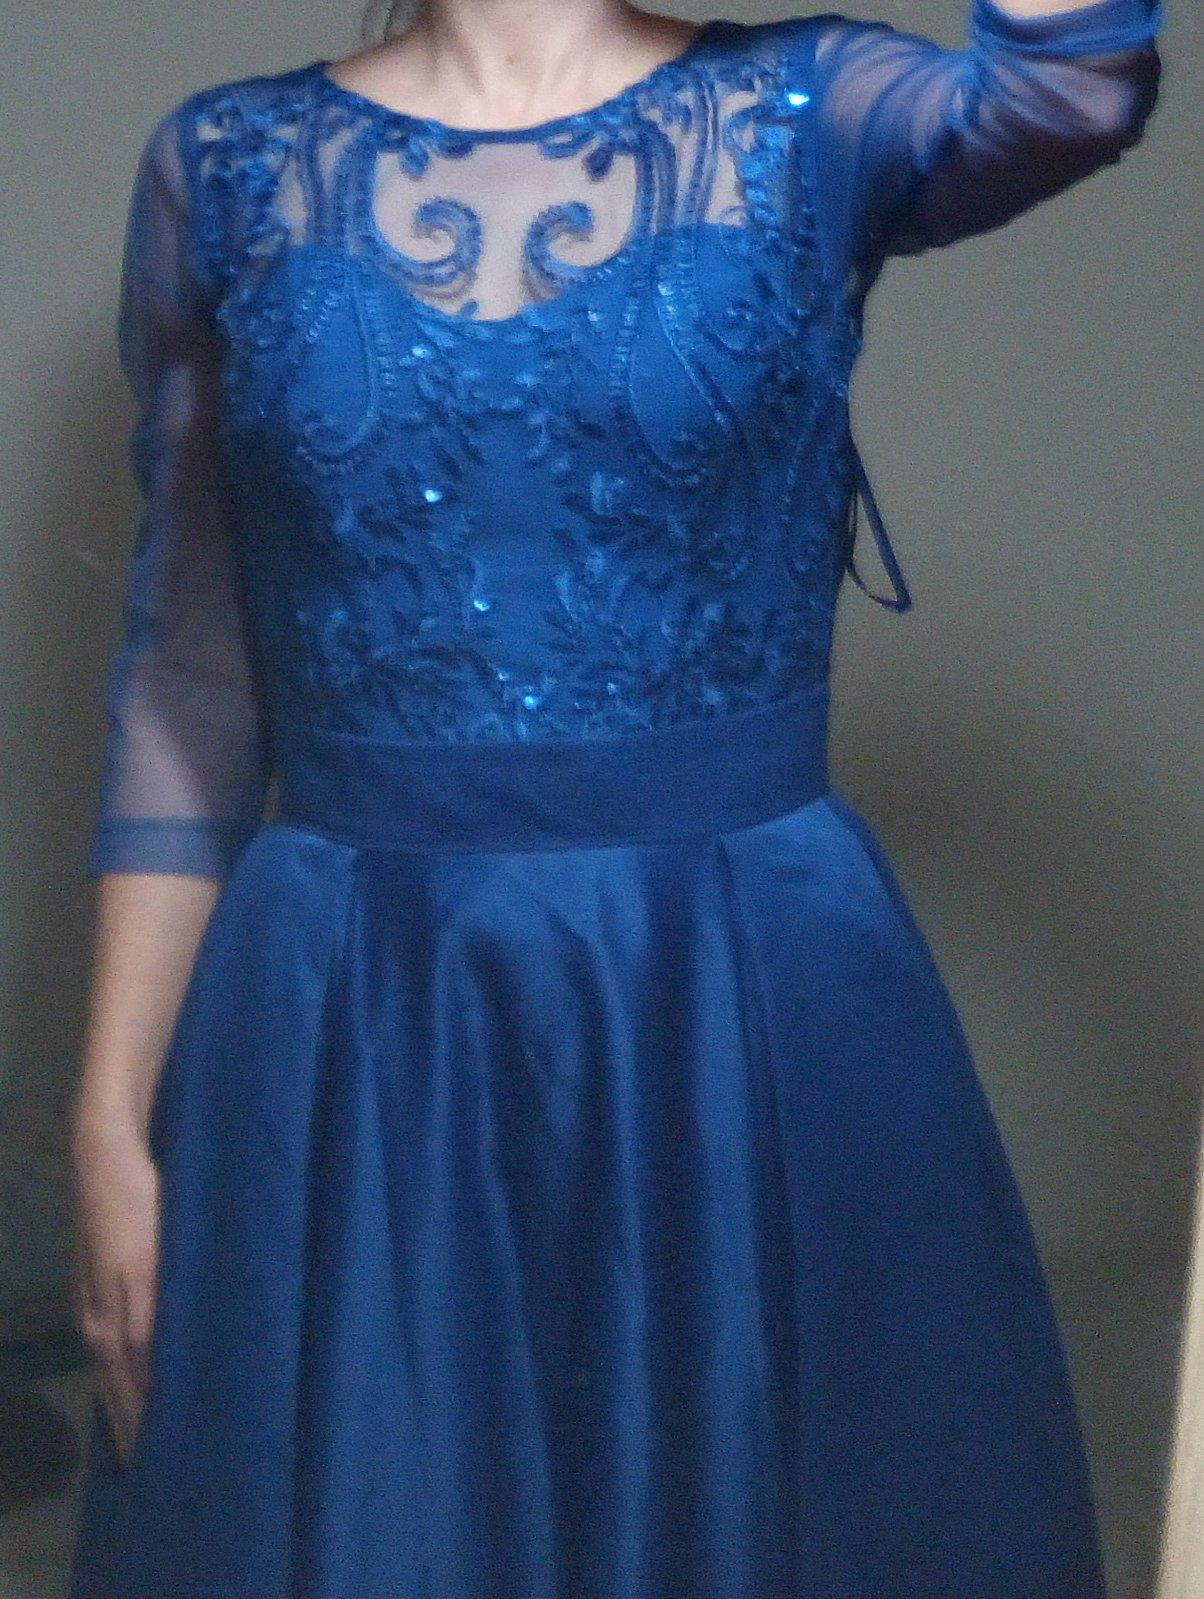 Kráľovsky modré spoločenské dlhé šaty XS - Obrázok č. 4